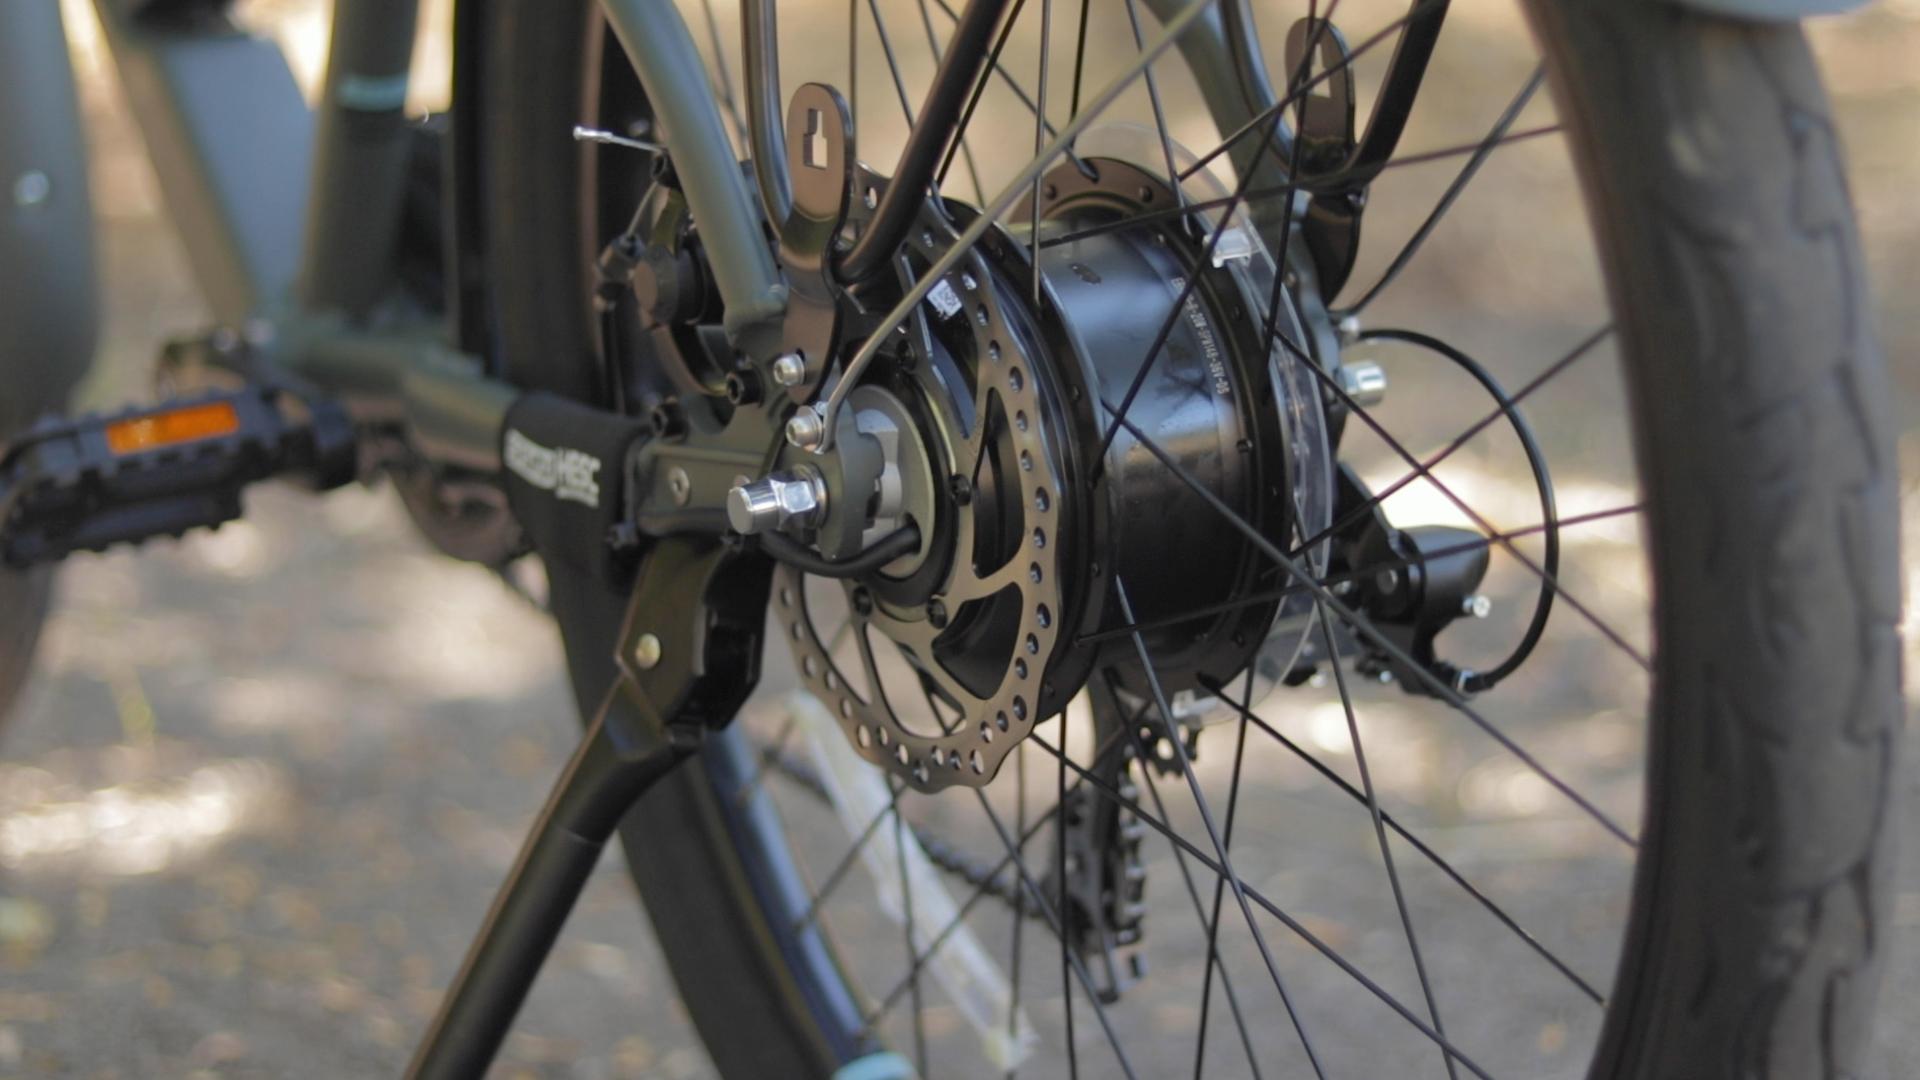 electrified-reviews-izip-simi-electric-bike-review-suntour-hesc-motor-2.jpg